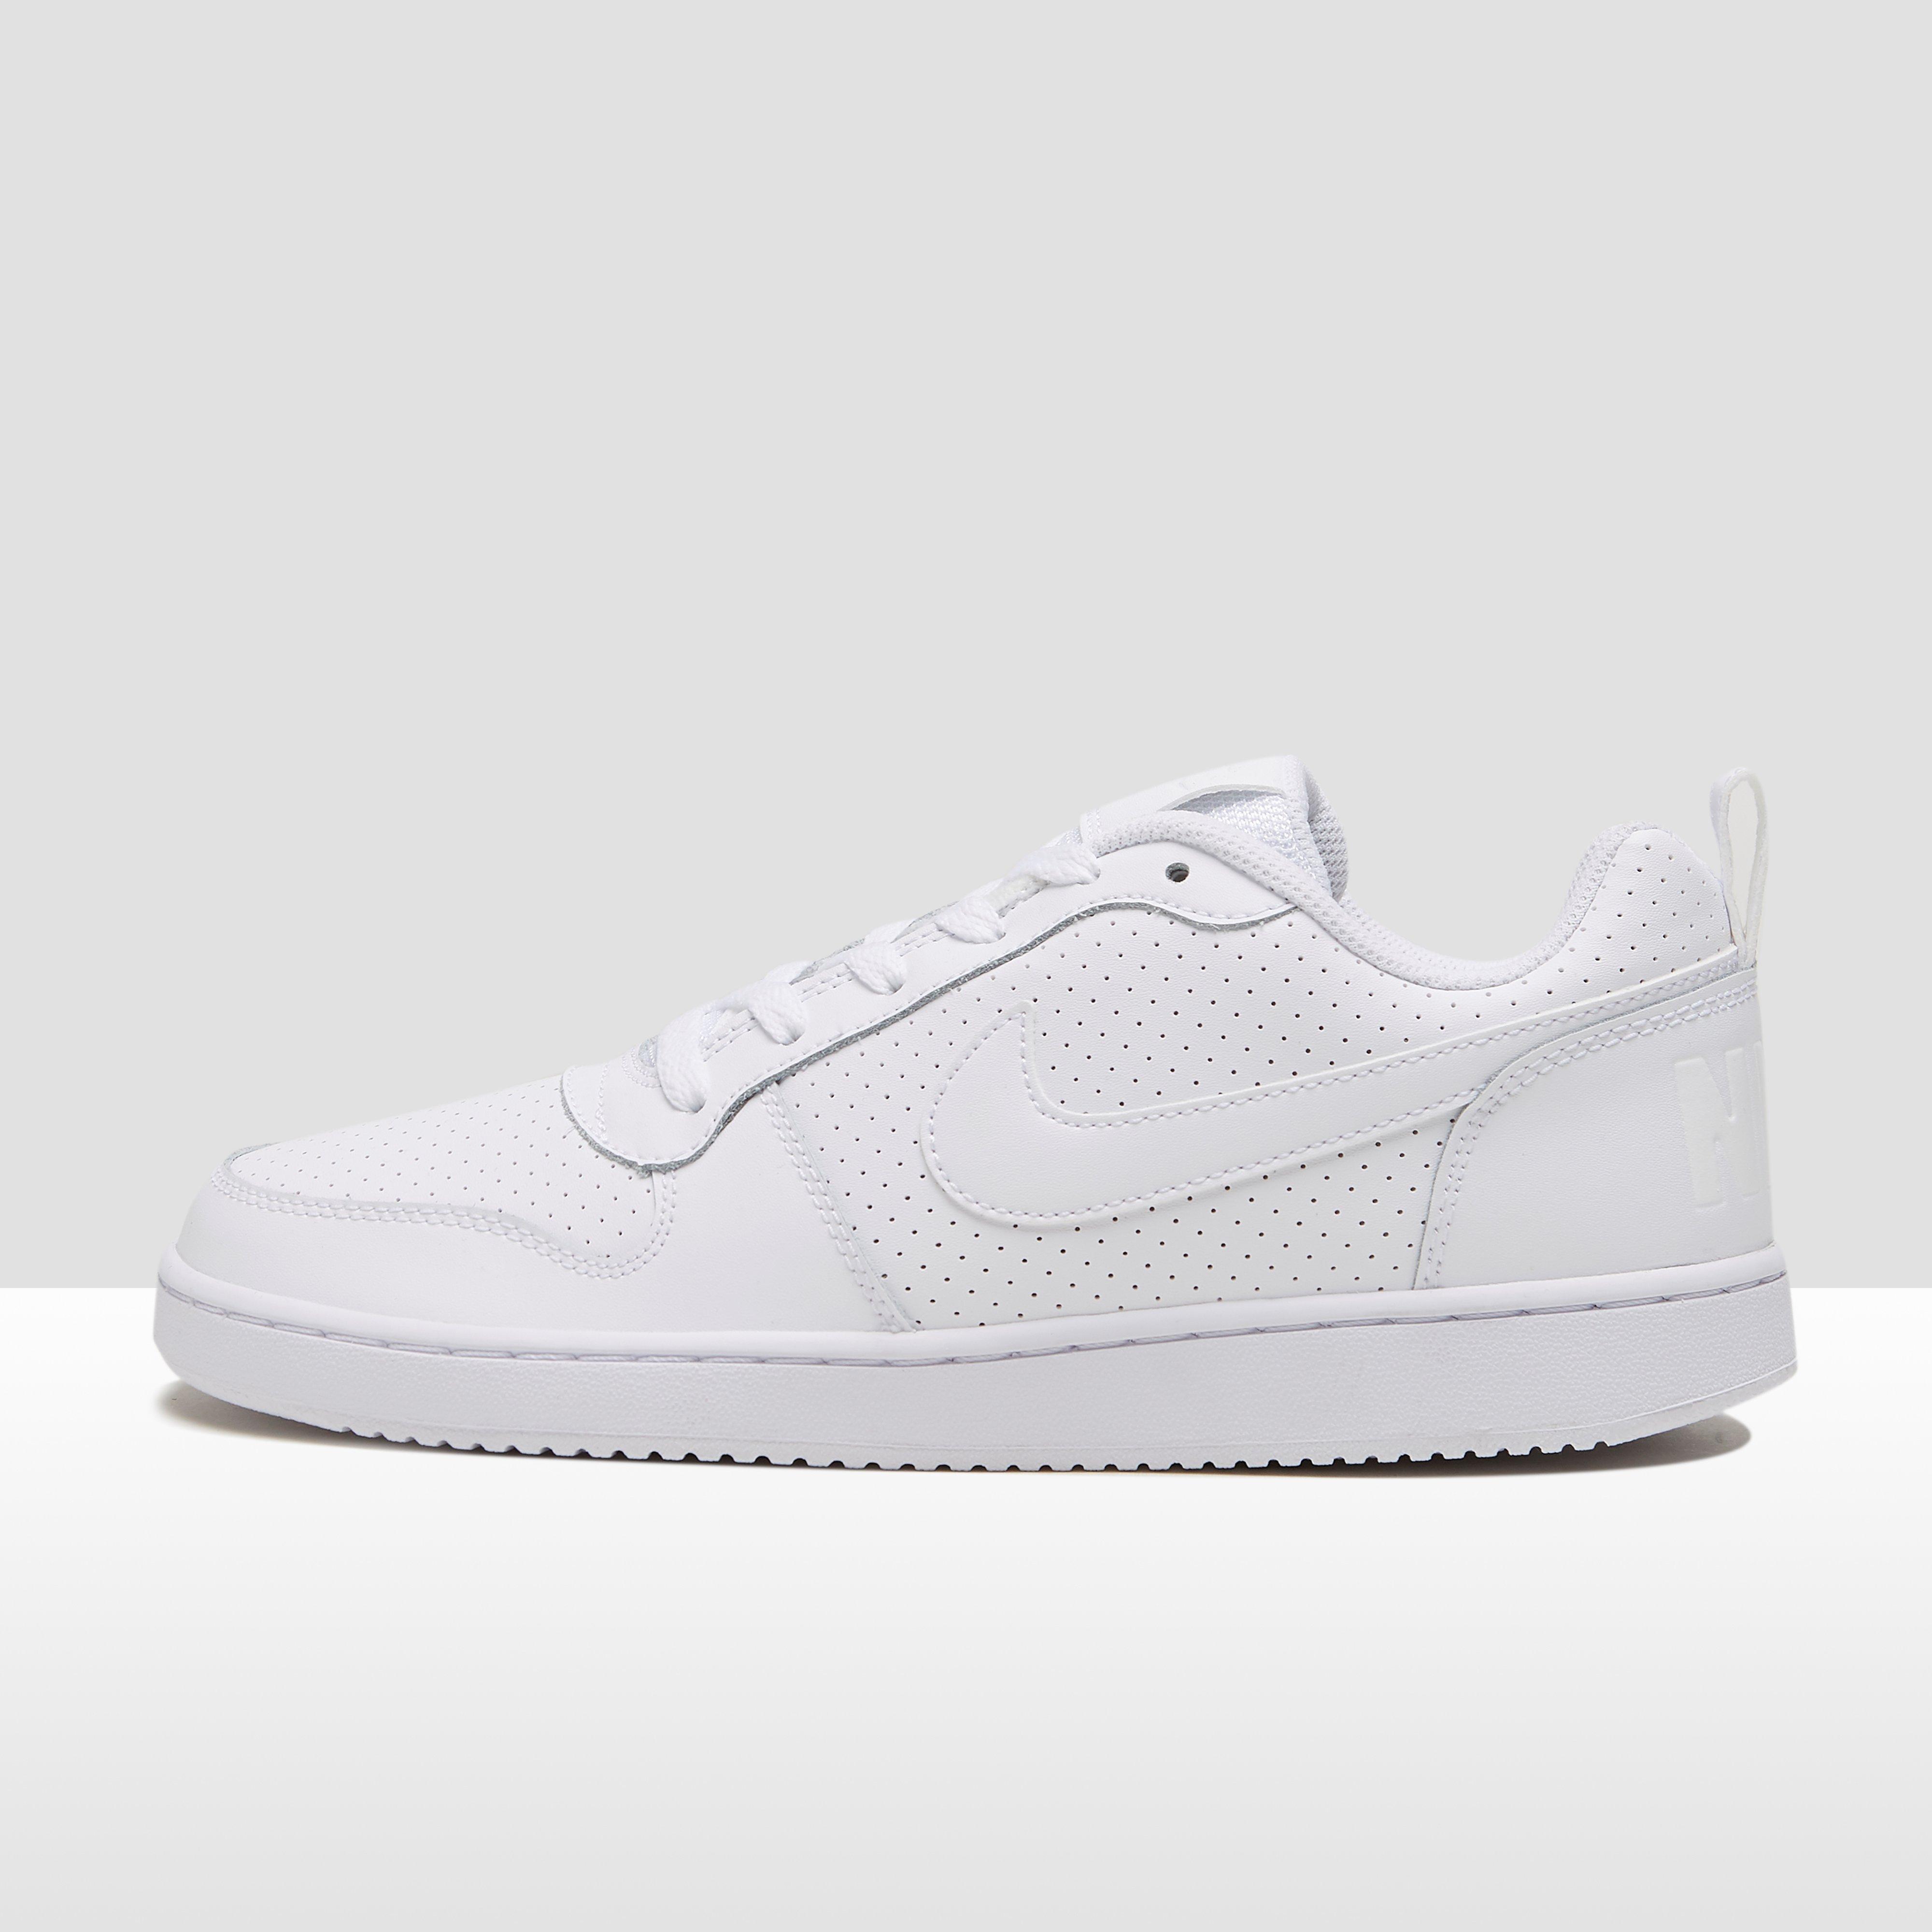 Chaussures Nike Blanches Pour Femmes 4QHjUcV